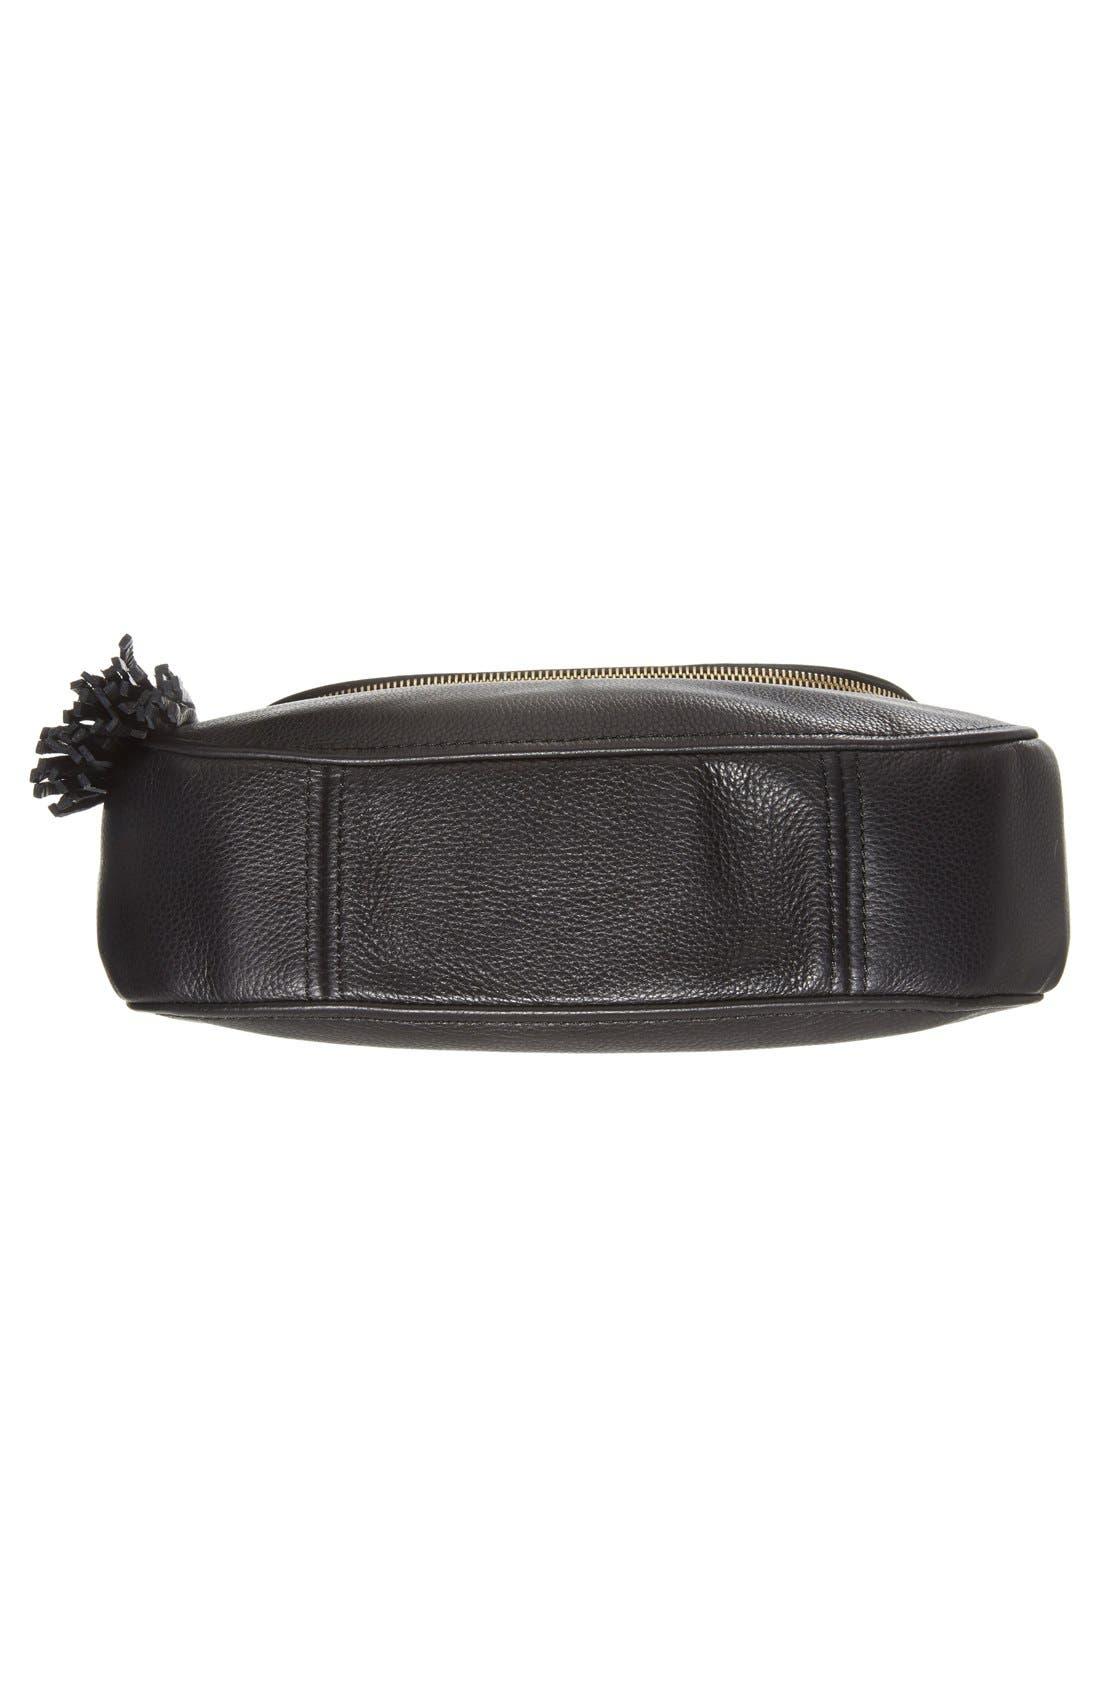 'Bedford Tassel - Medium' Convertible Leather Shoulder Bag,                             Alternate thumbnail 2, color,                             005